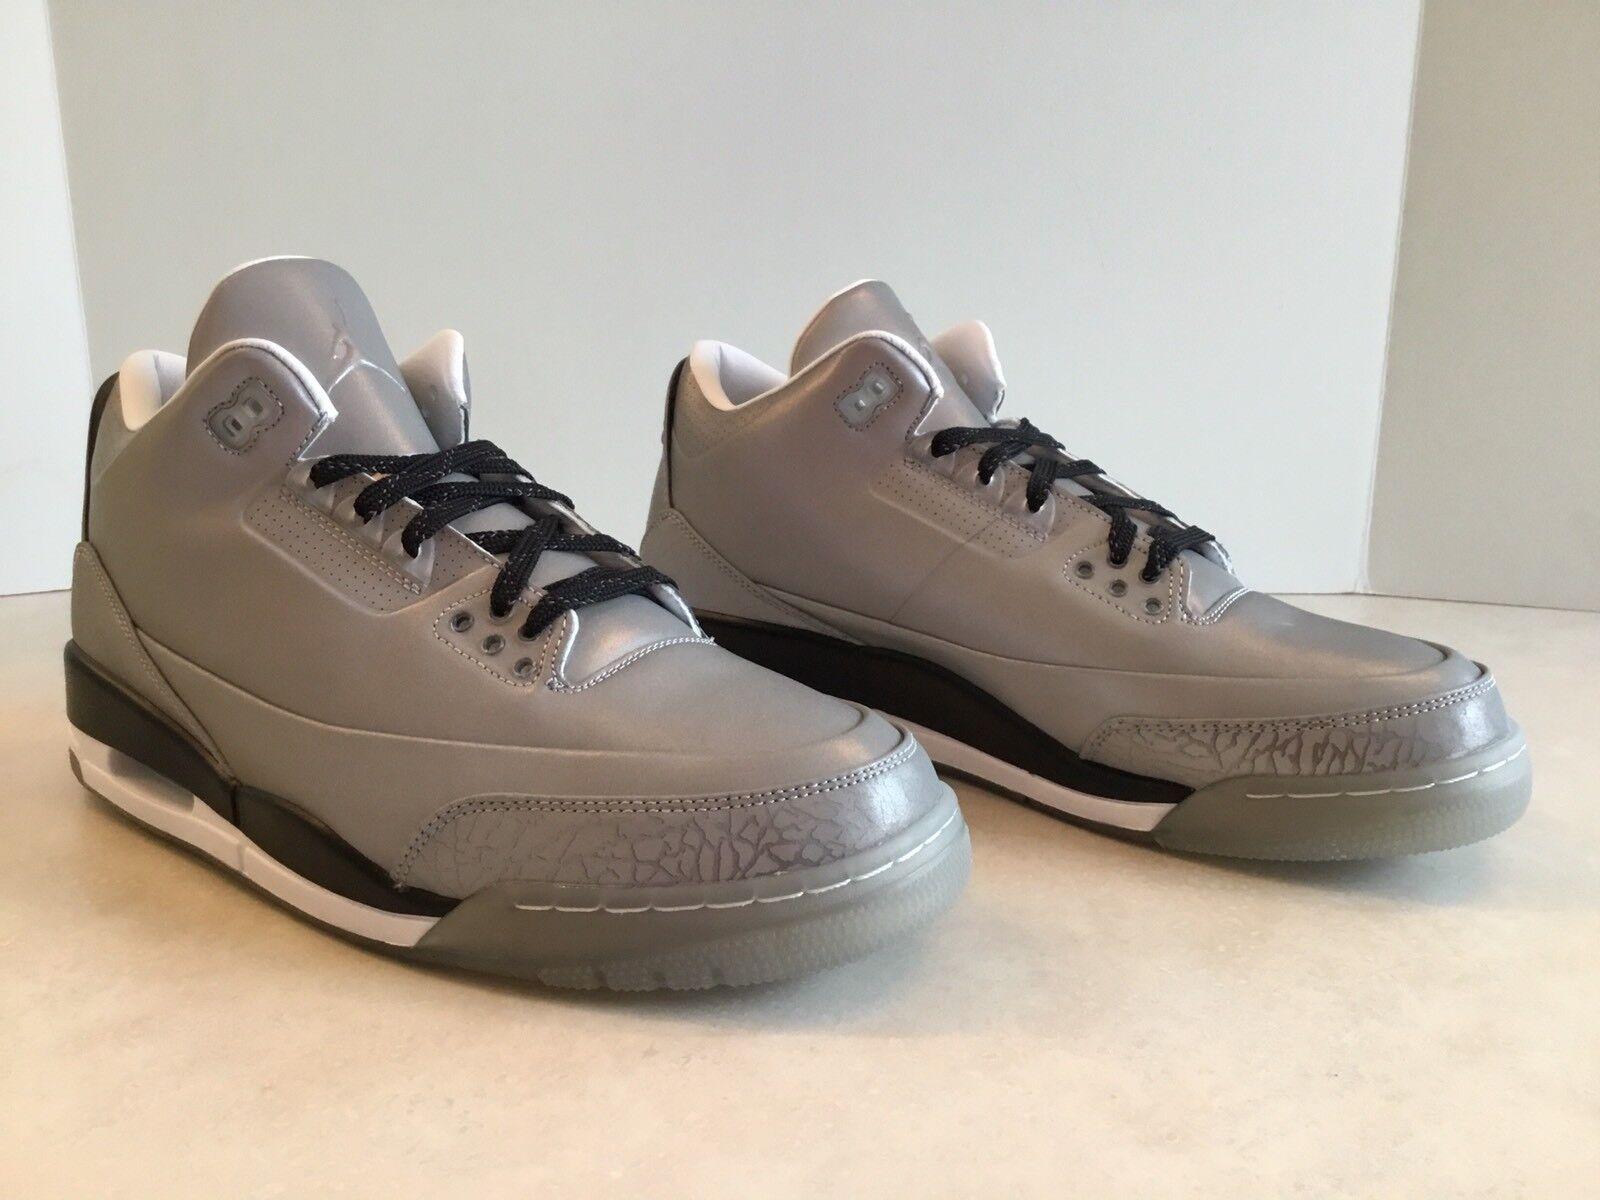 Nike air jordan 5lab3 riflettente ds uomini dimensioni 3m, argento